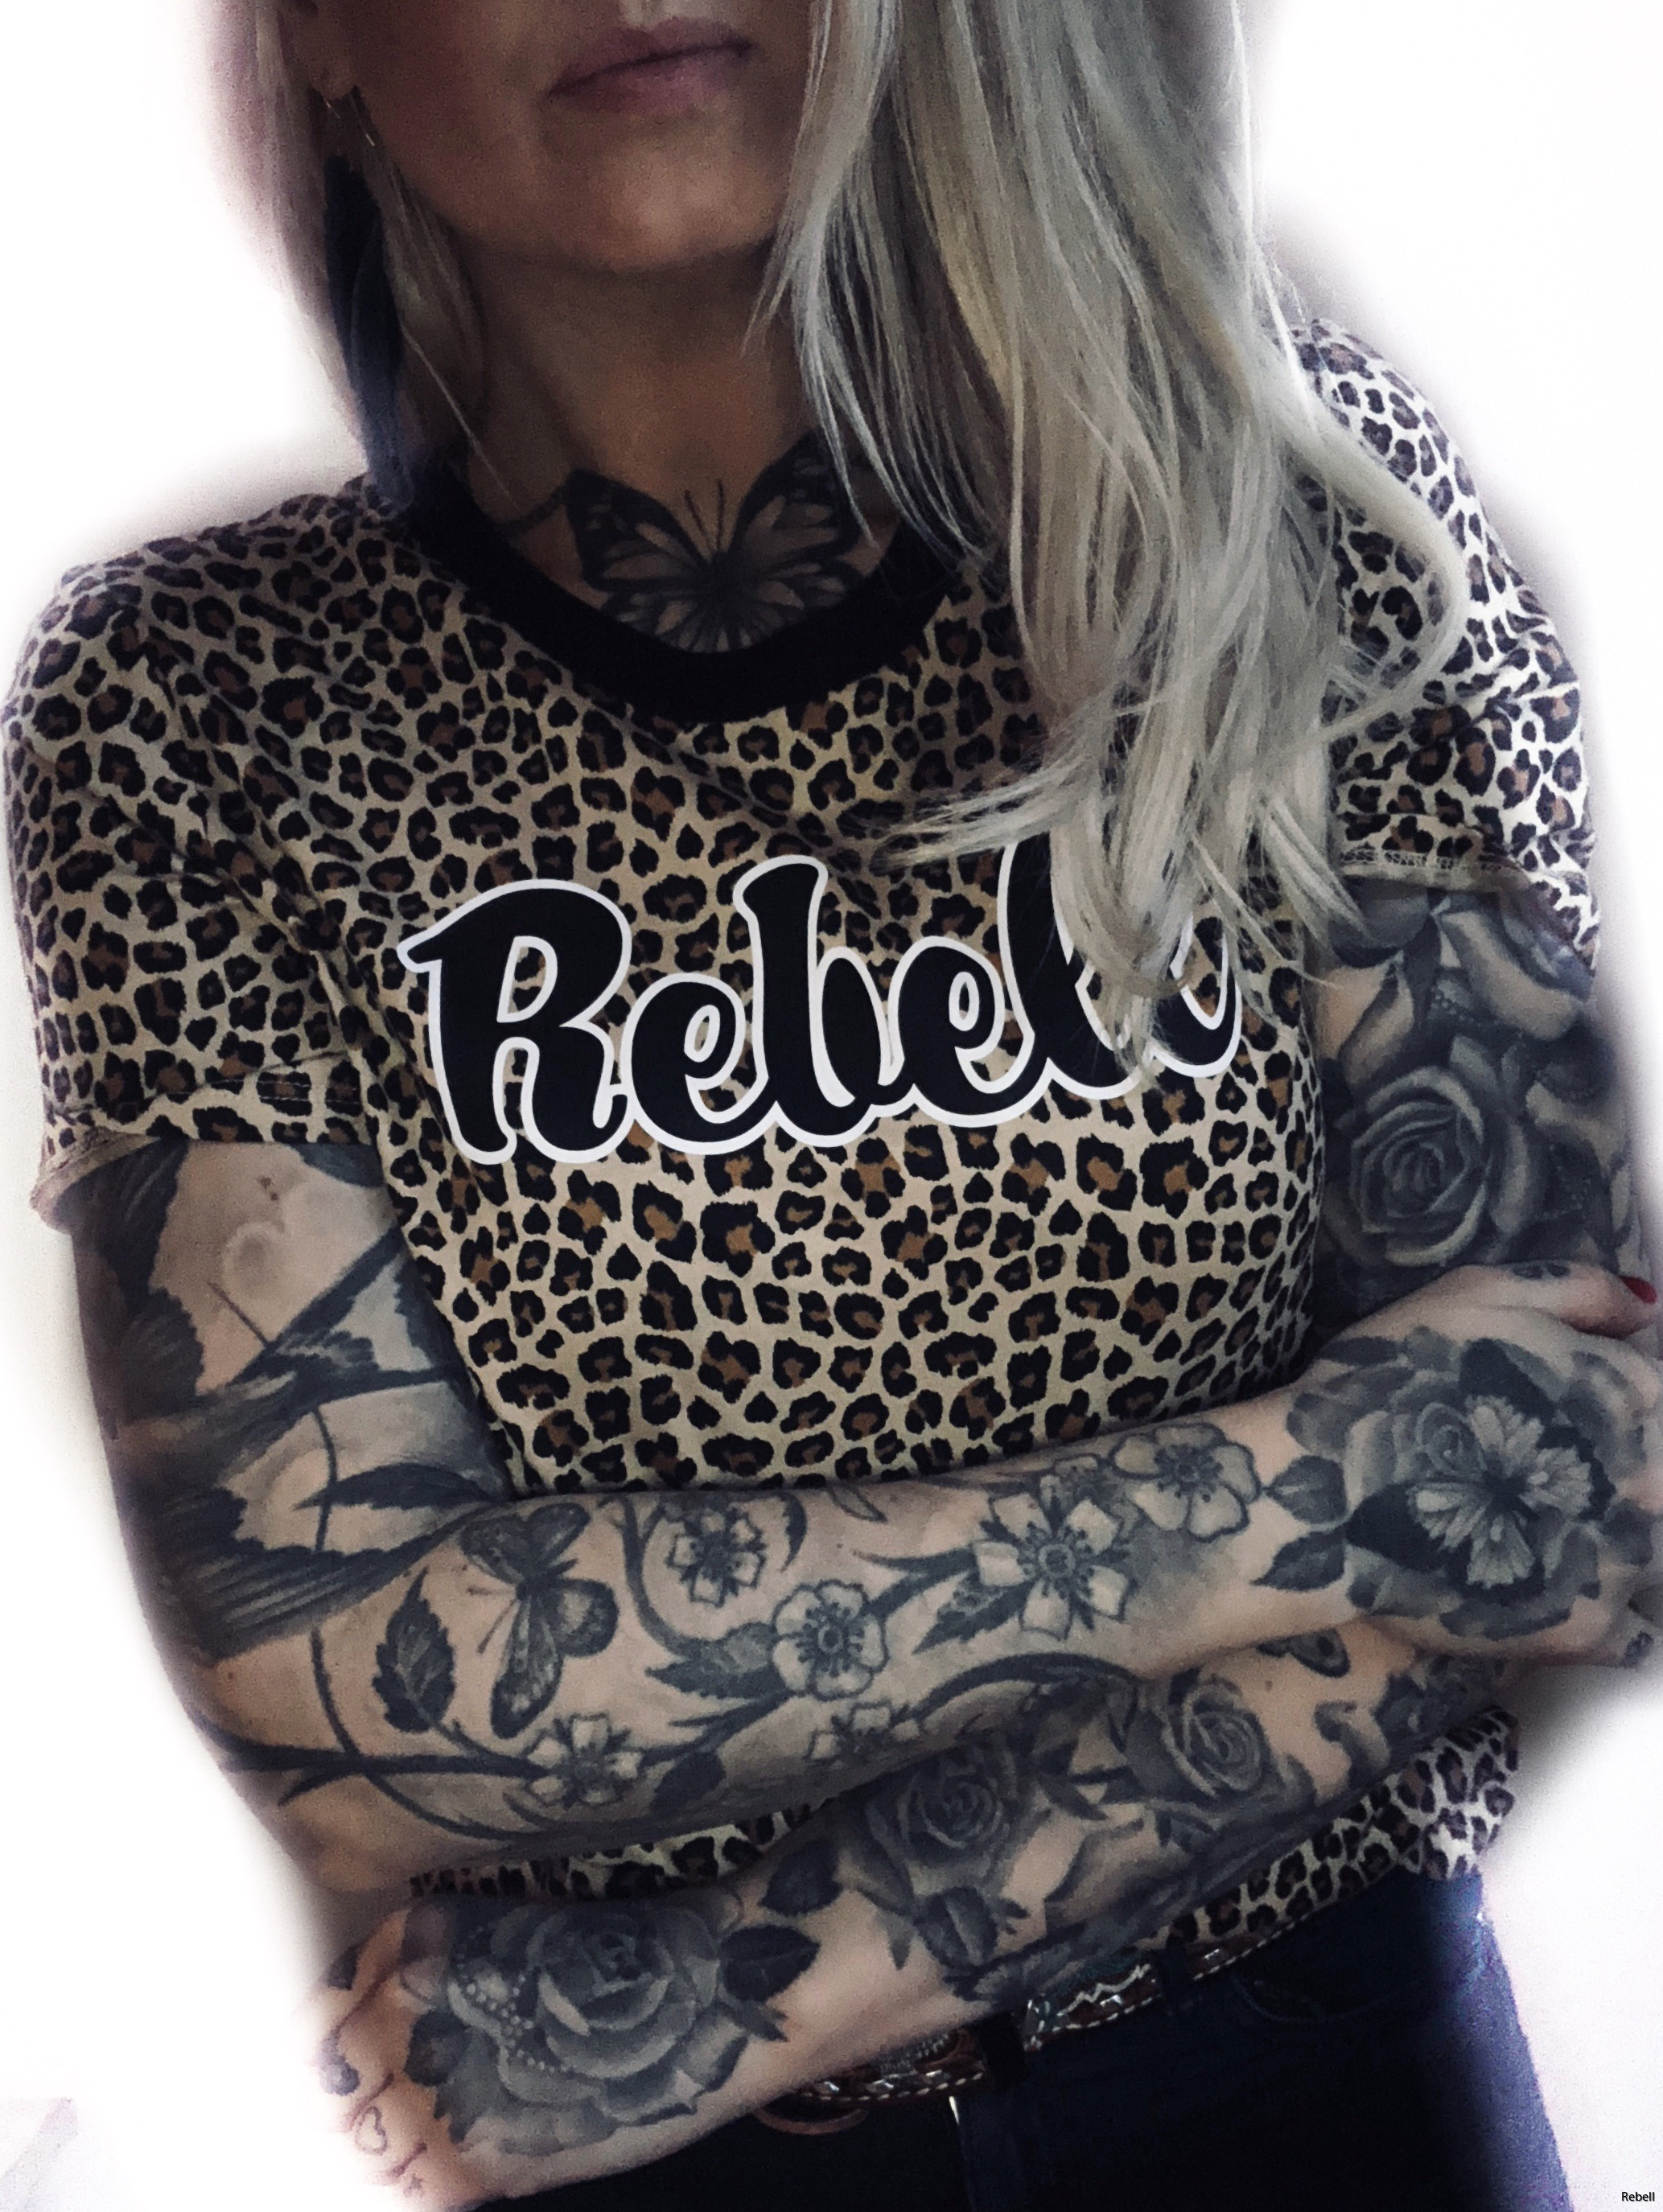 leopard leopardmönster djur djurmönster rebell rebellclothes inspiration rebel kläder attityde design